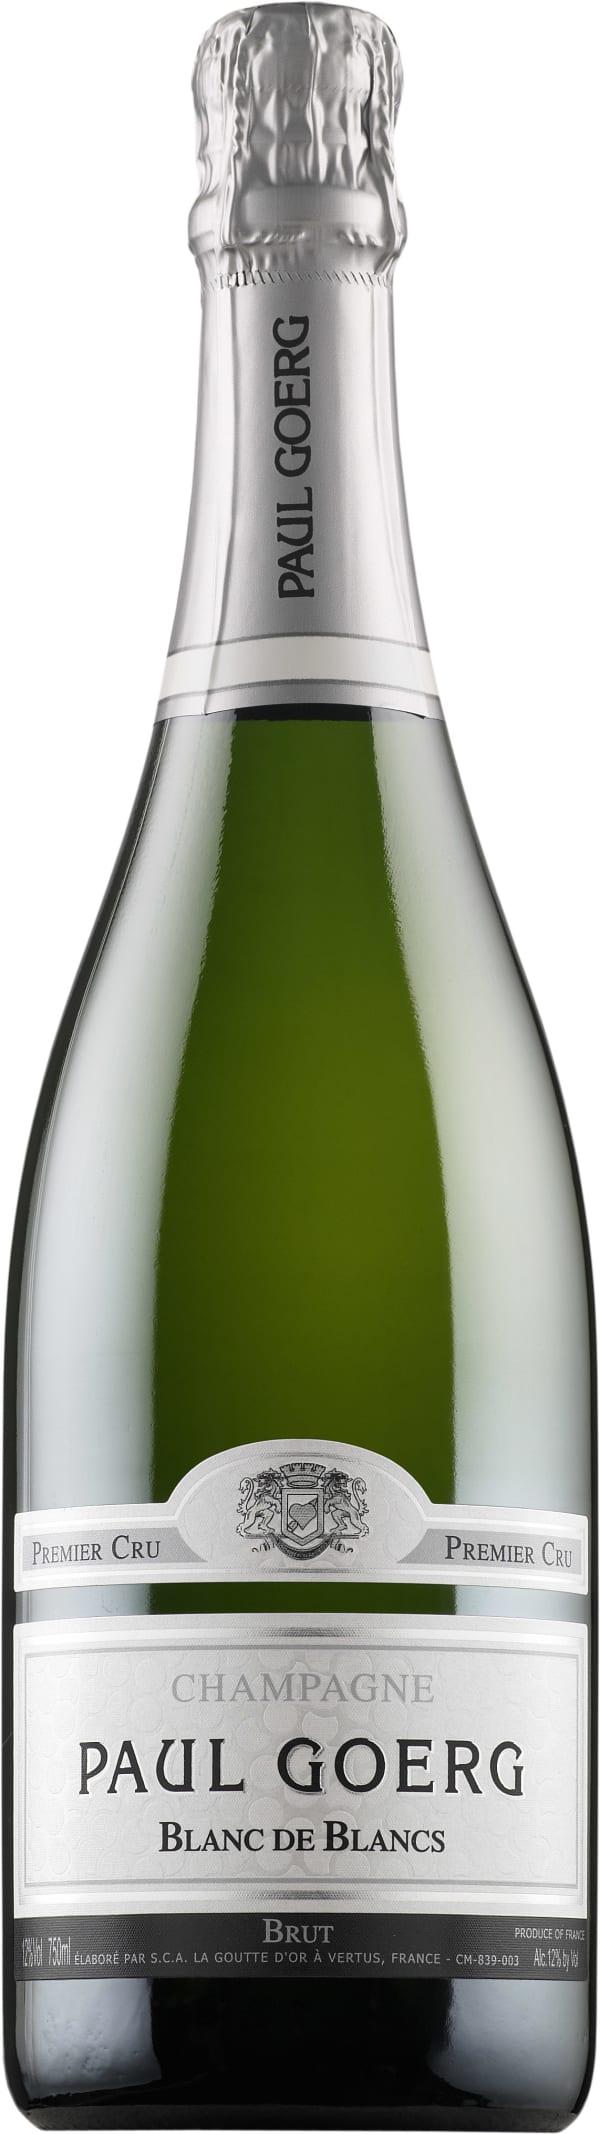 Paul Goerg Premier Cru Blanc de Blancs Champagne  Brut